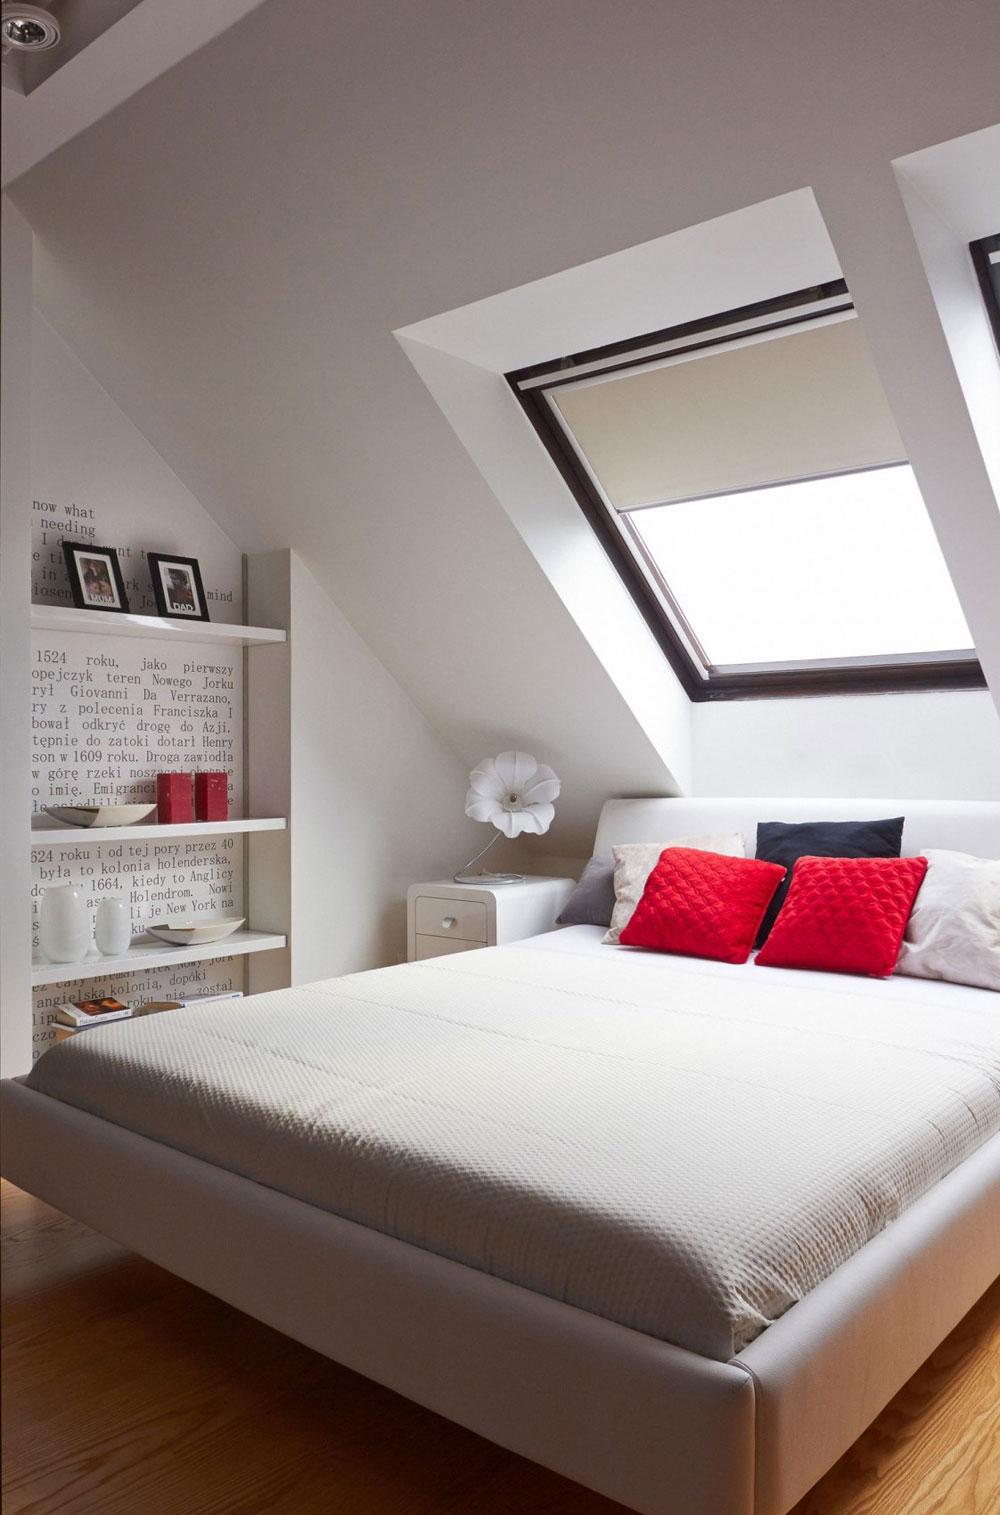 Unique Bedroom Interior Designs That Will Inspire You 6 Unique Bedroom Interior Designs That Will Inspire You